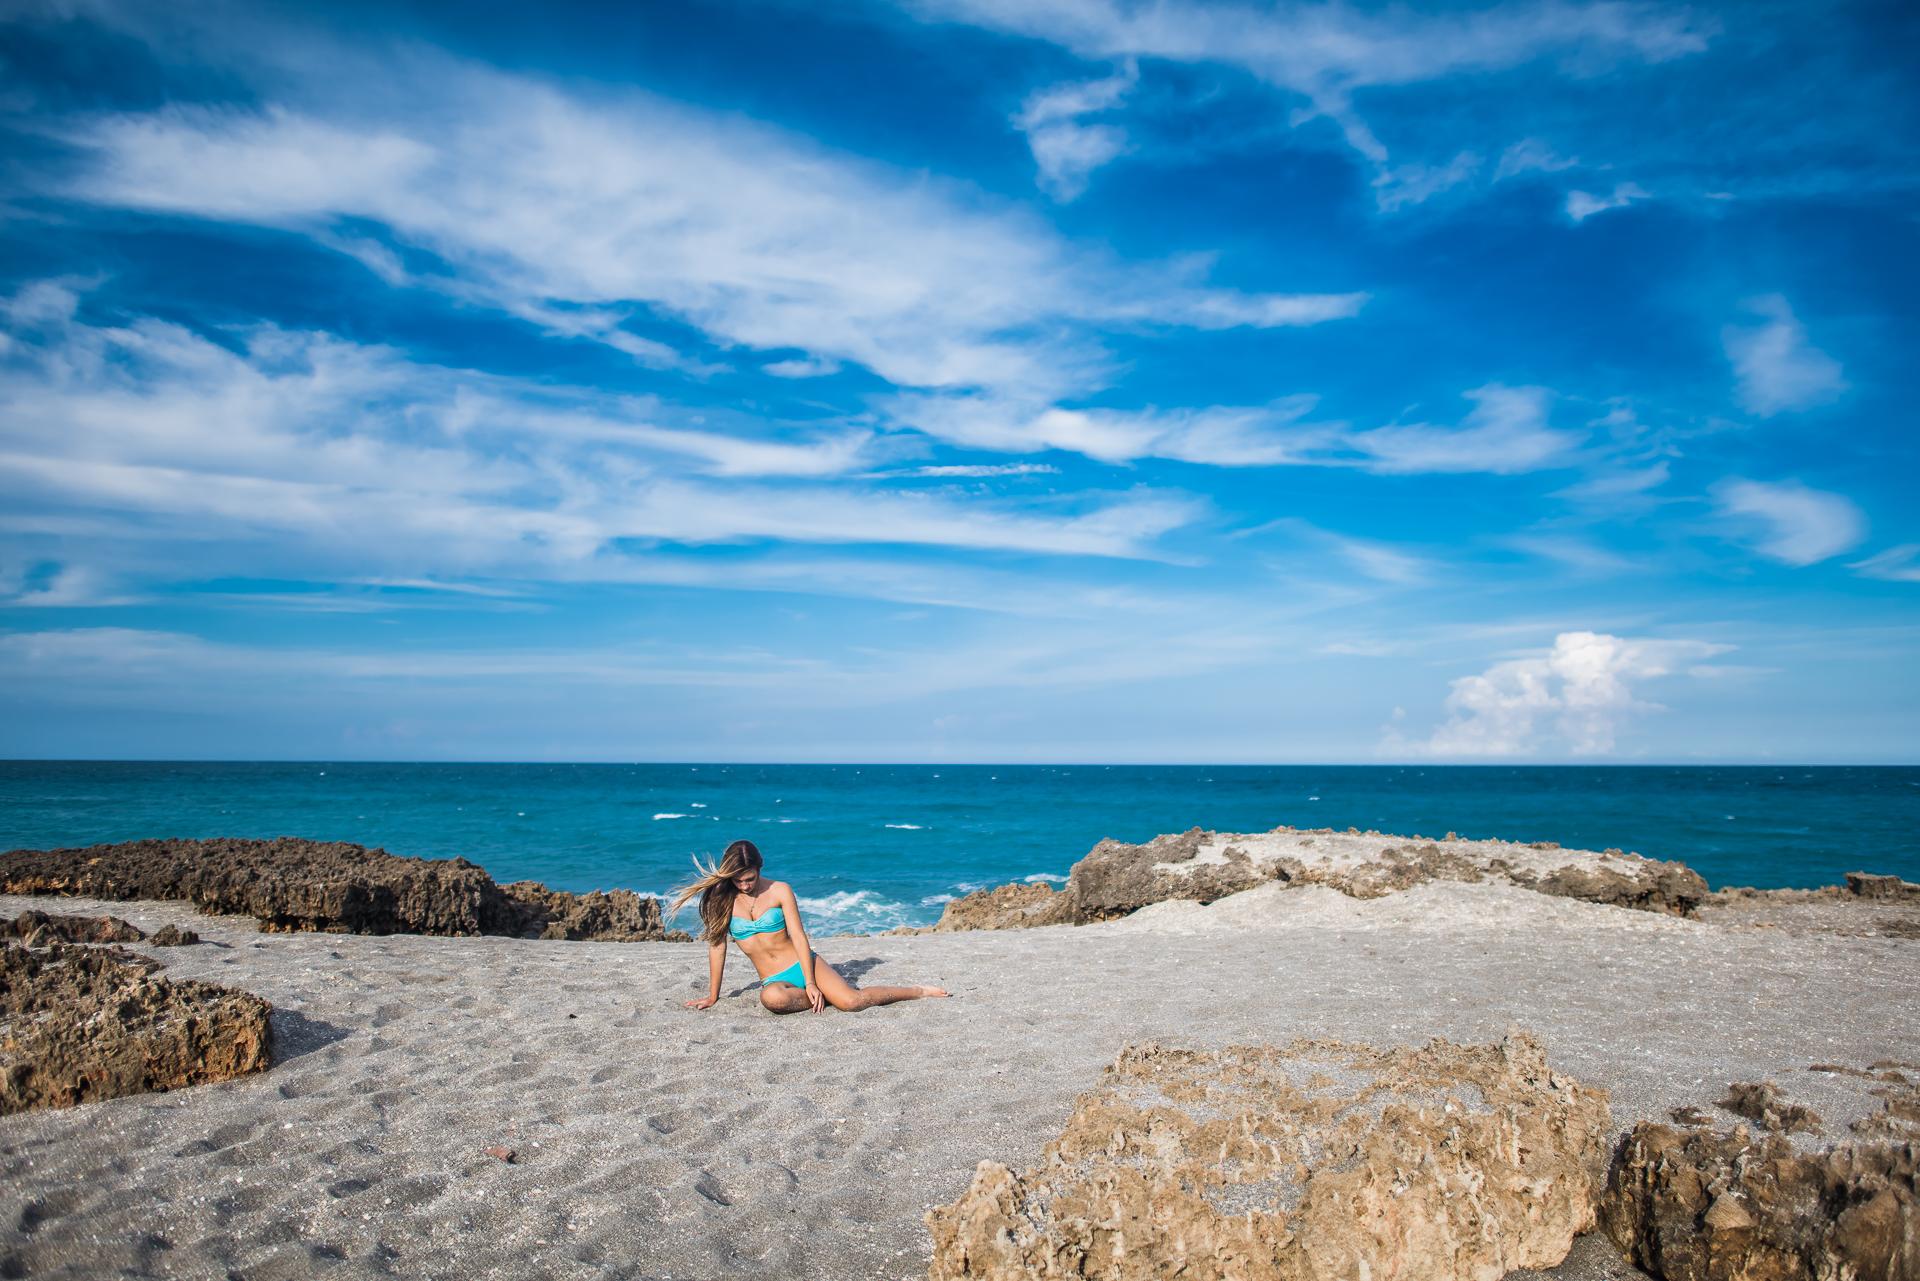 bahamasgirlblowingrocks-139.jpg